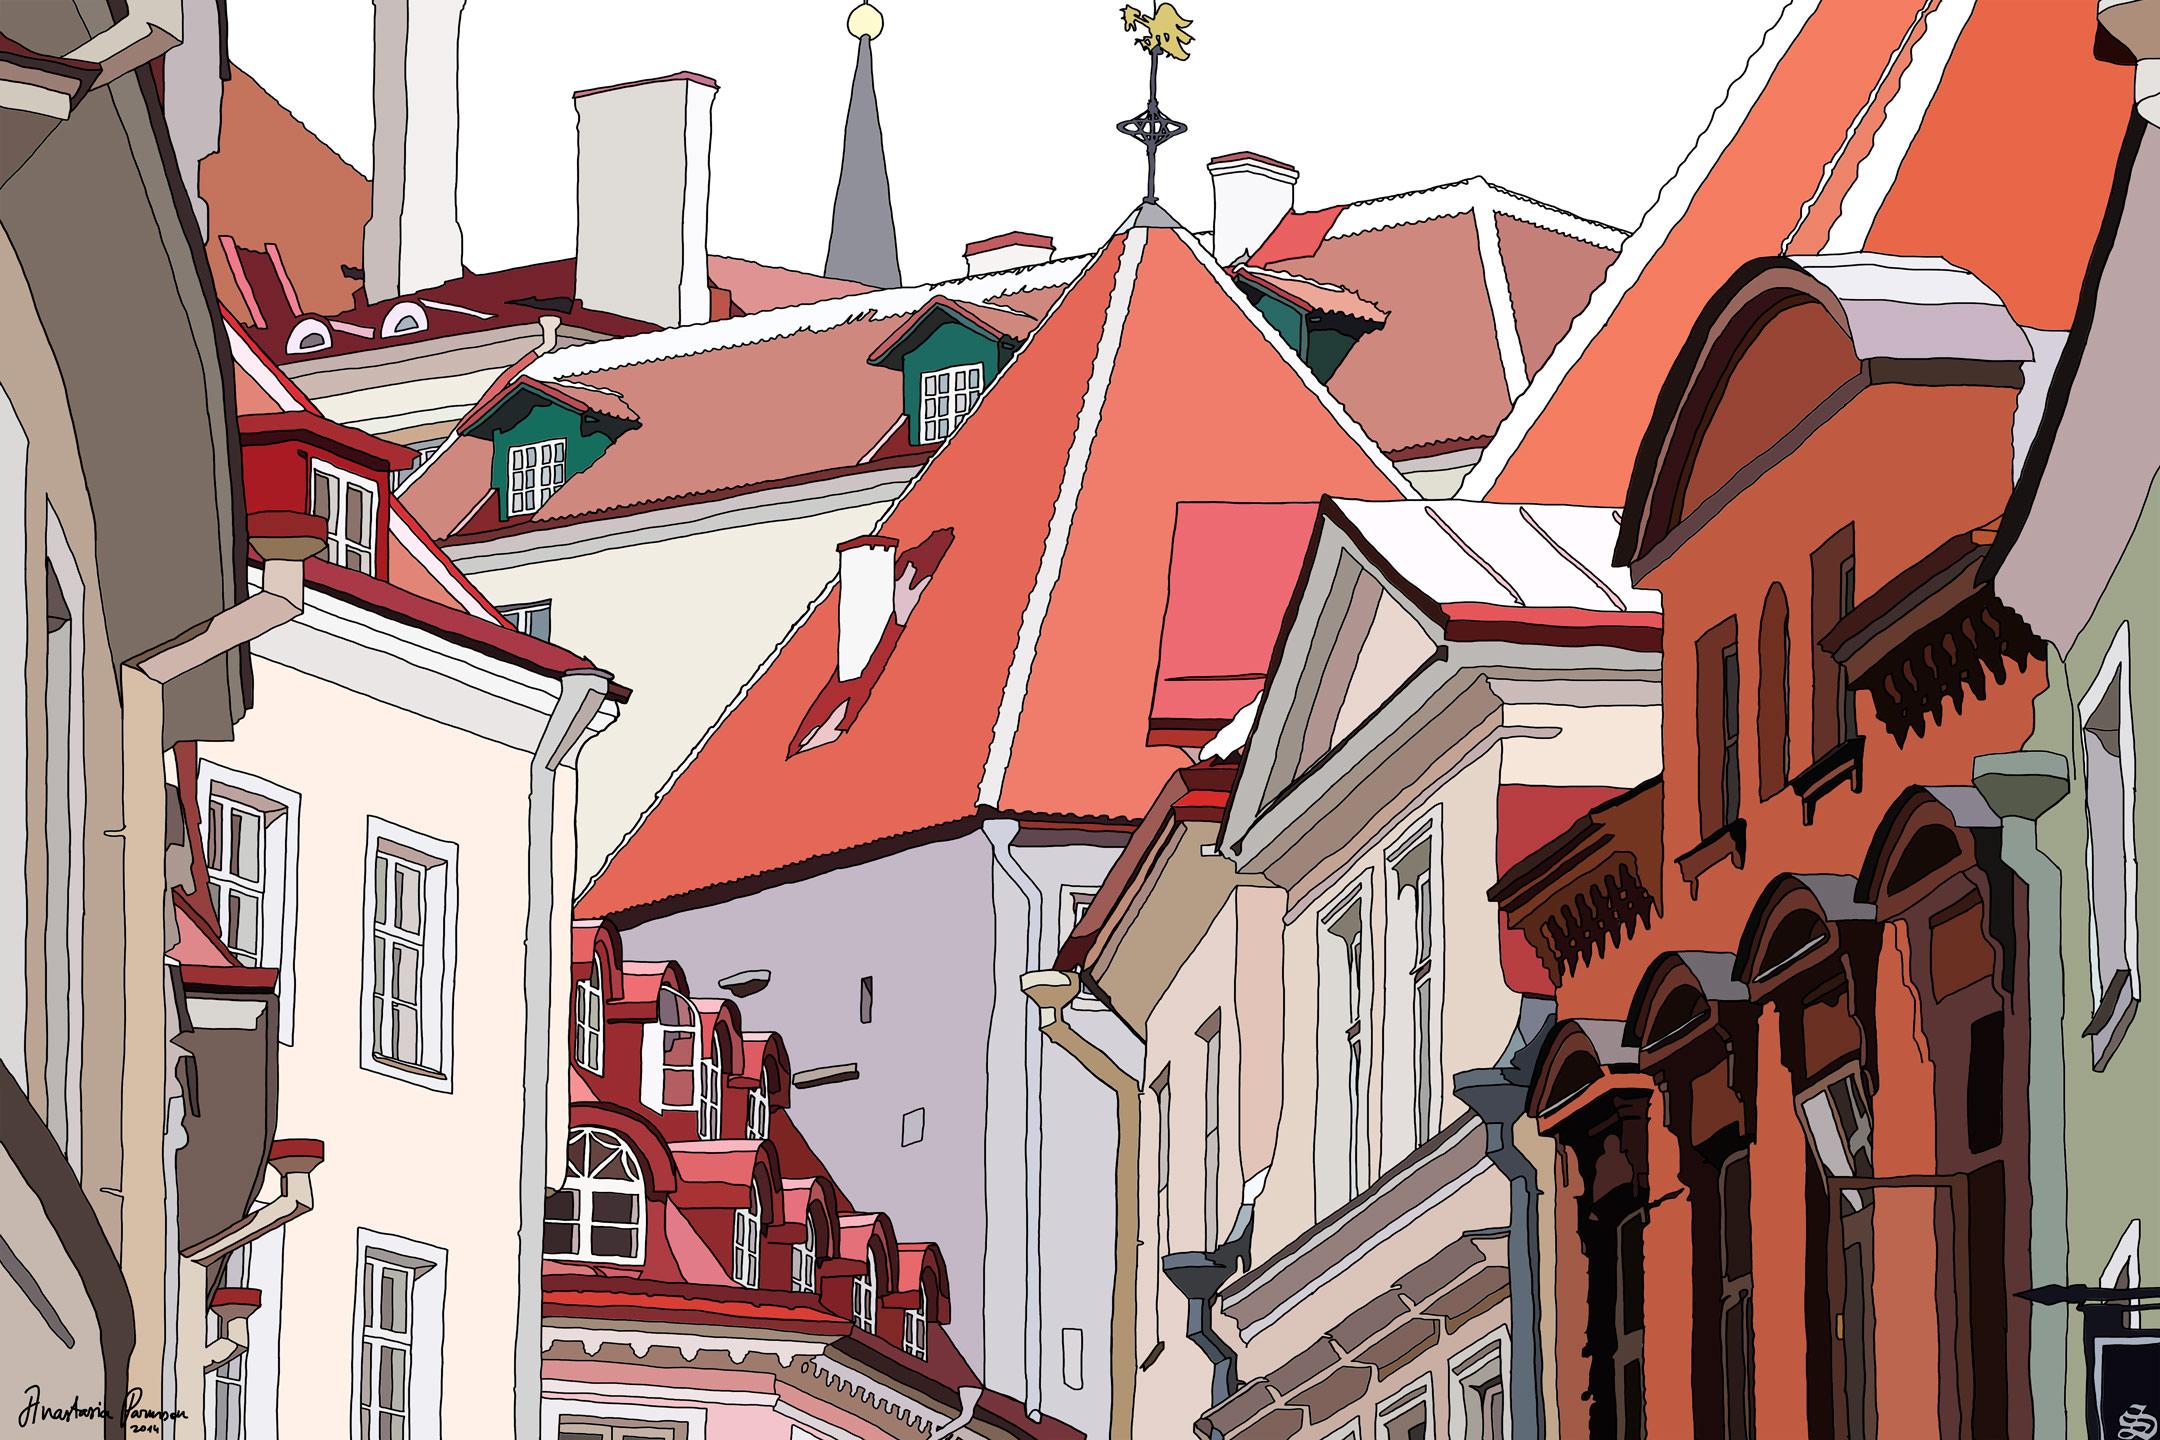 Roofs of Tallinn by Anastasia Parmson